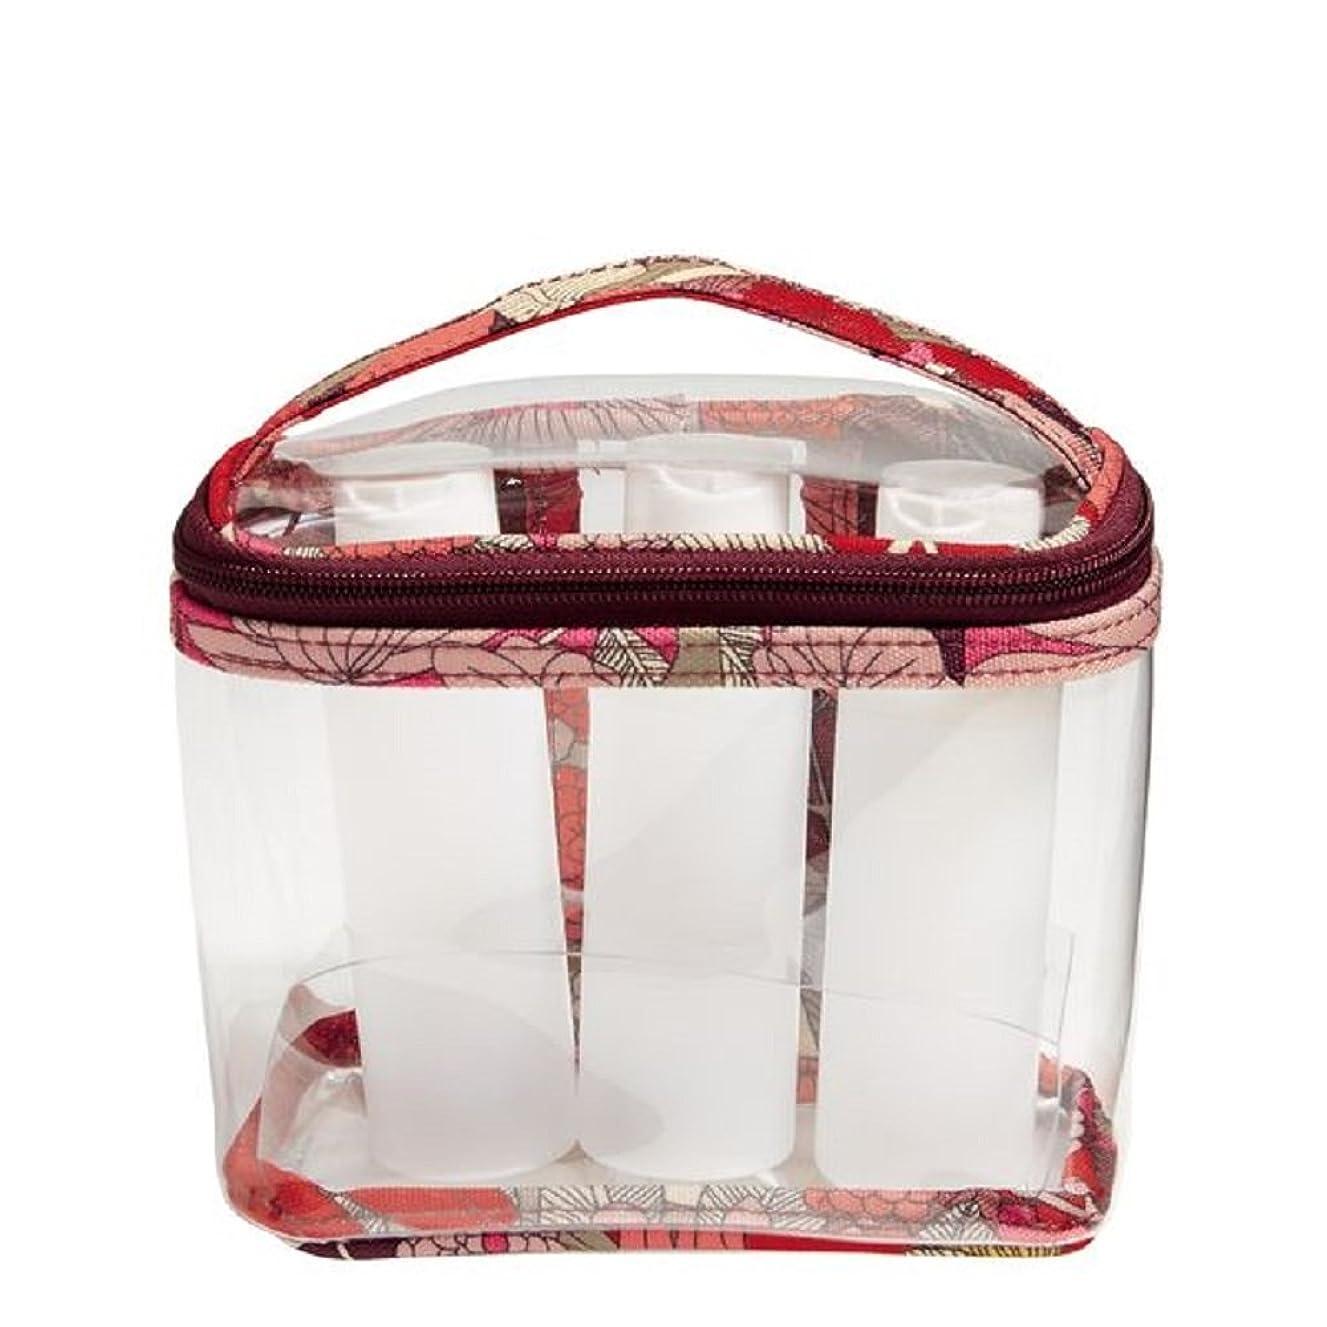 Vera Bradley 3-1-1 Cosmetic Bag in Bohemian Blooms